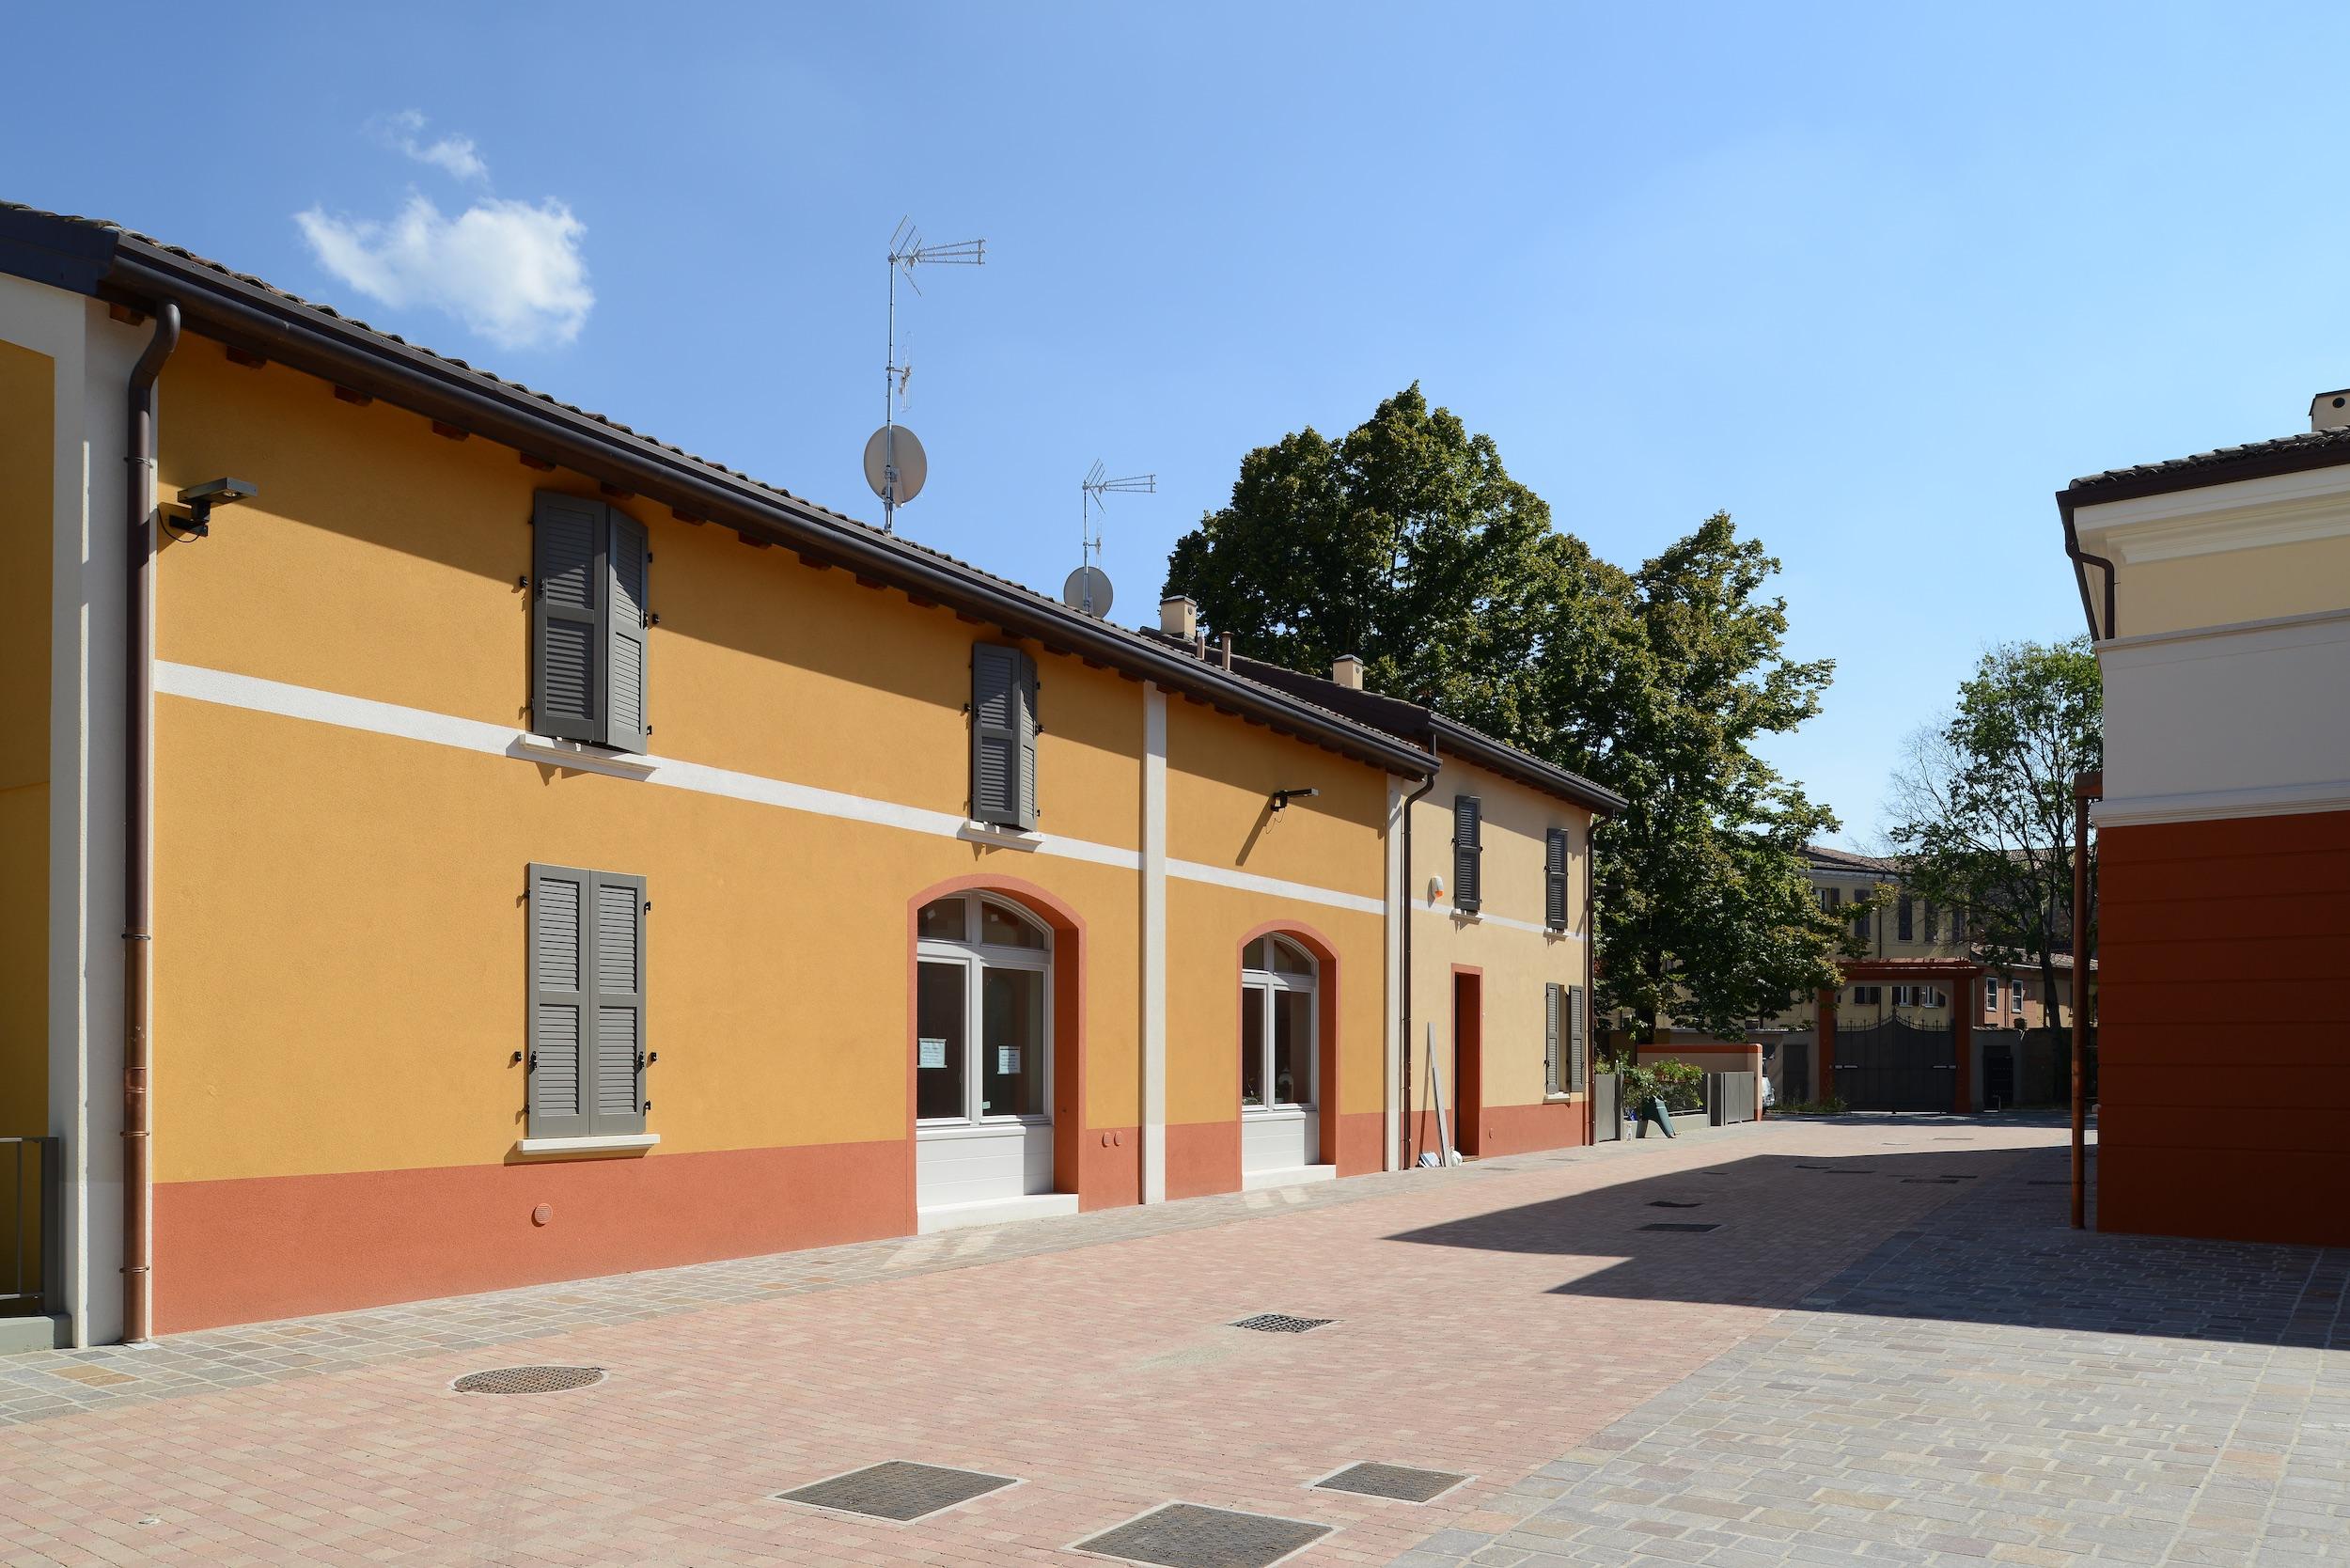 6309 Studio Bacchi Architetti Santa Chiara Residenziale